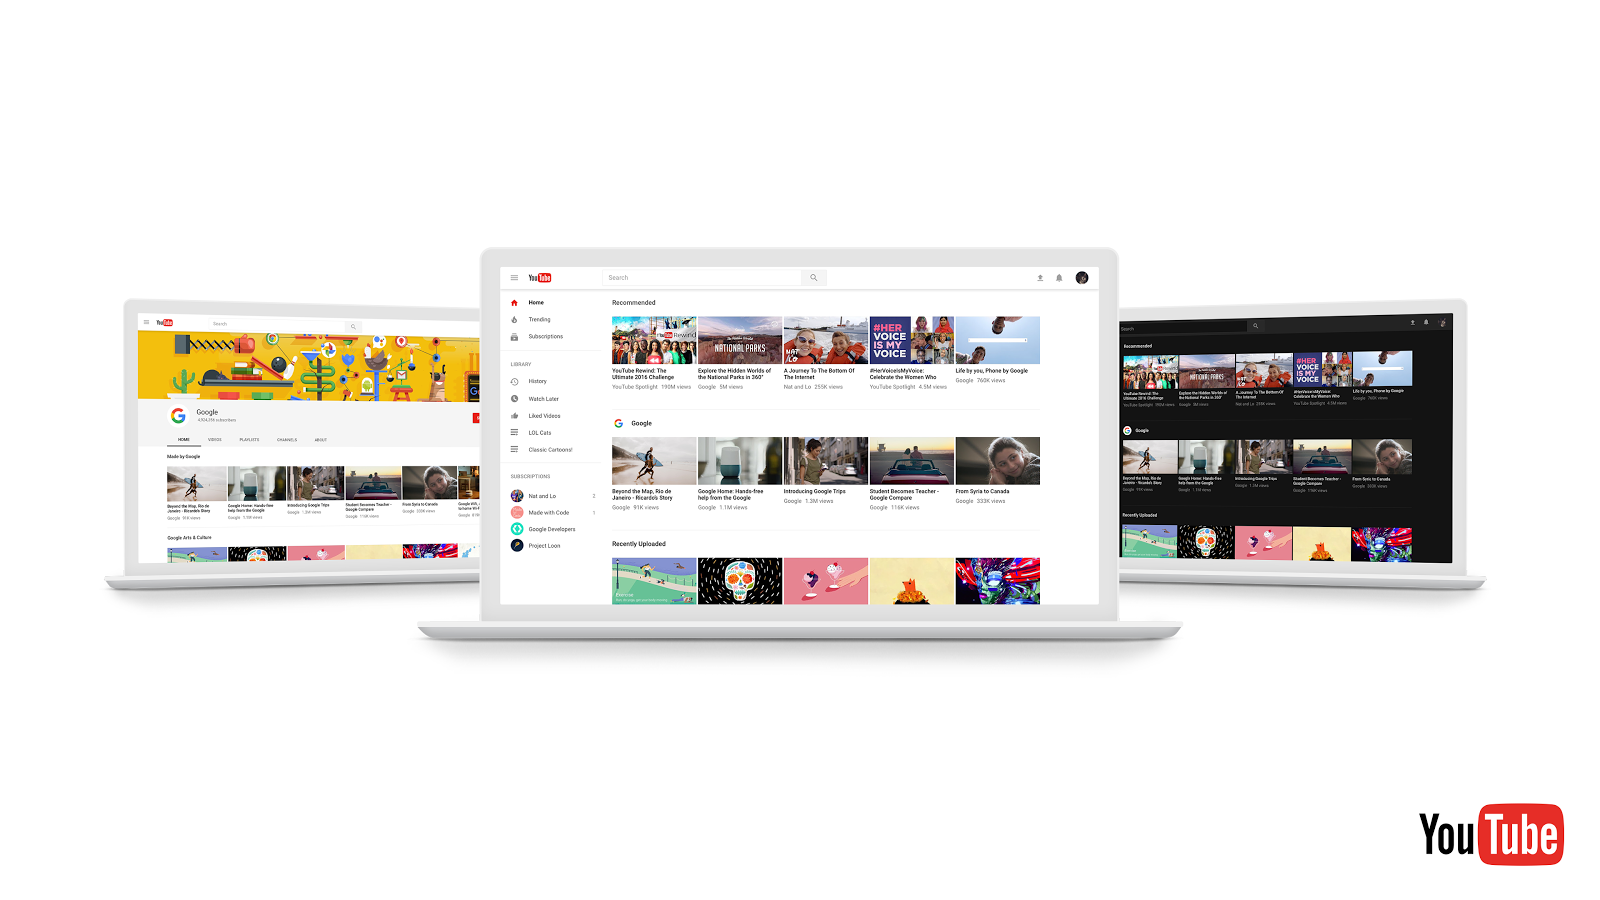 YouTube Announces App Redesign, New Logo | Social Media Today